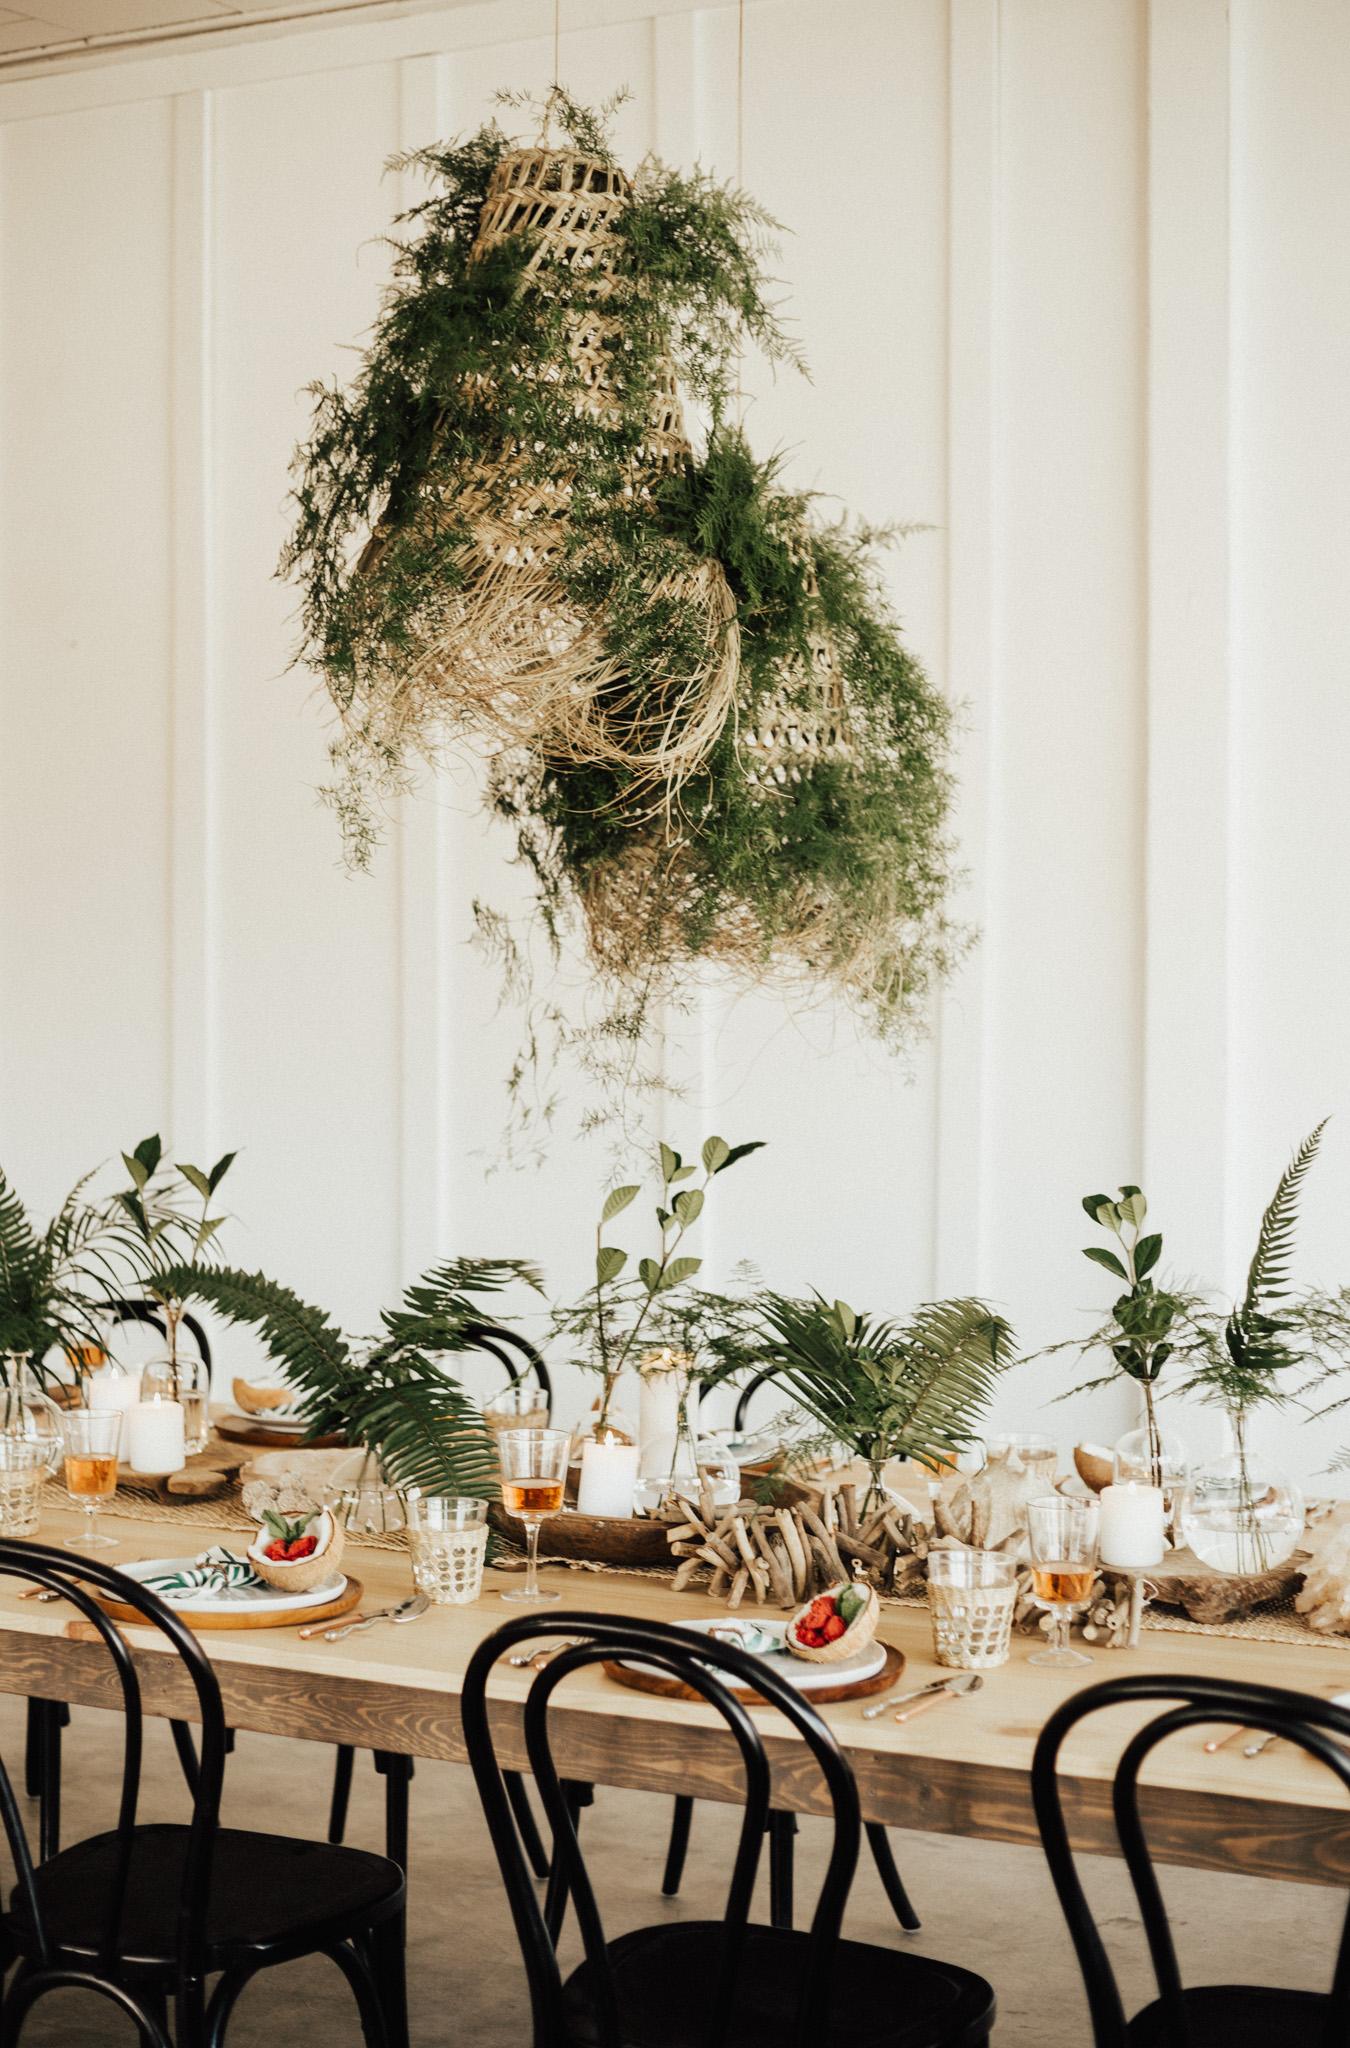 Bali_Inspired_Wedding-65.jpg